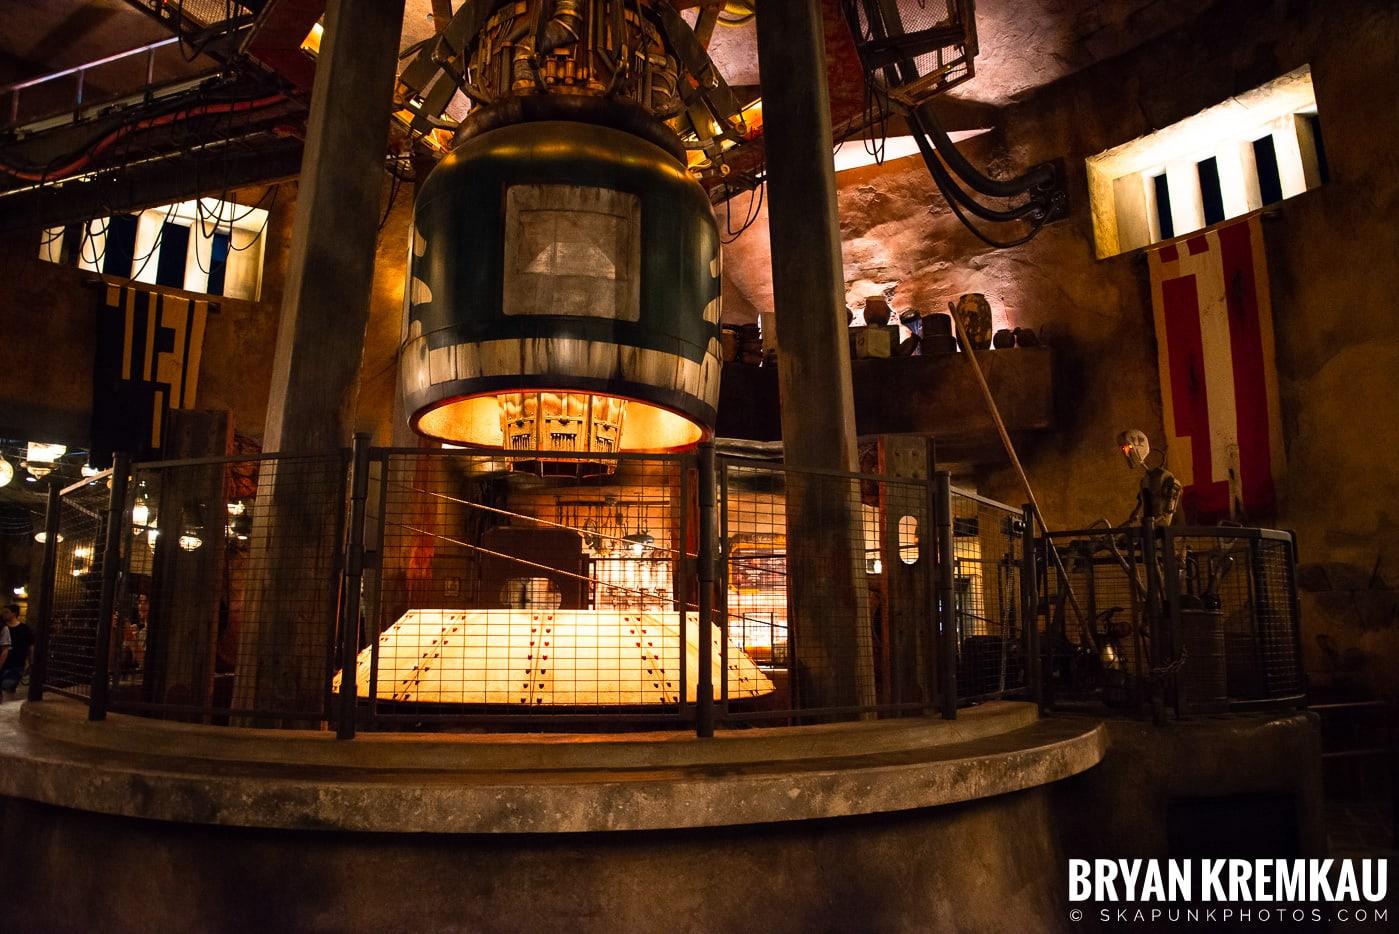 Walt Disney World Vacation: Day 6 (Magic Kingdom, Epcot, Disney's Hollywood Studios) - 10.4.19 (23)